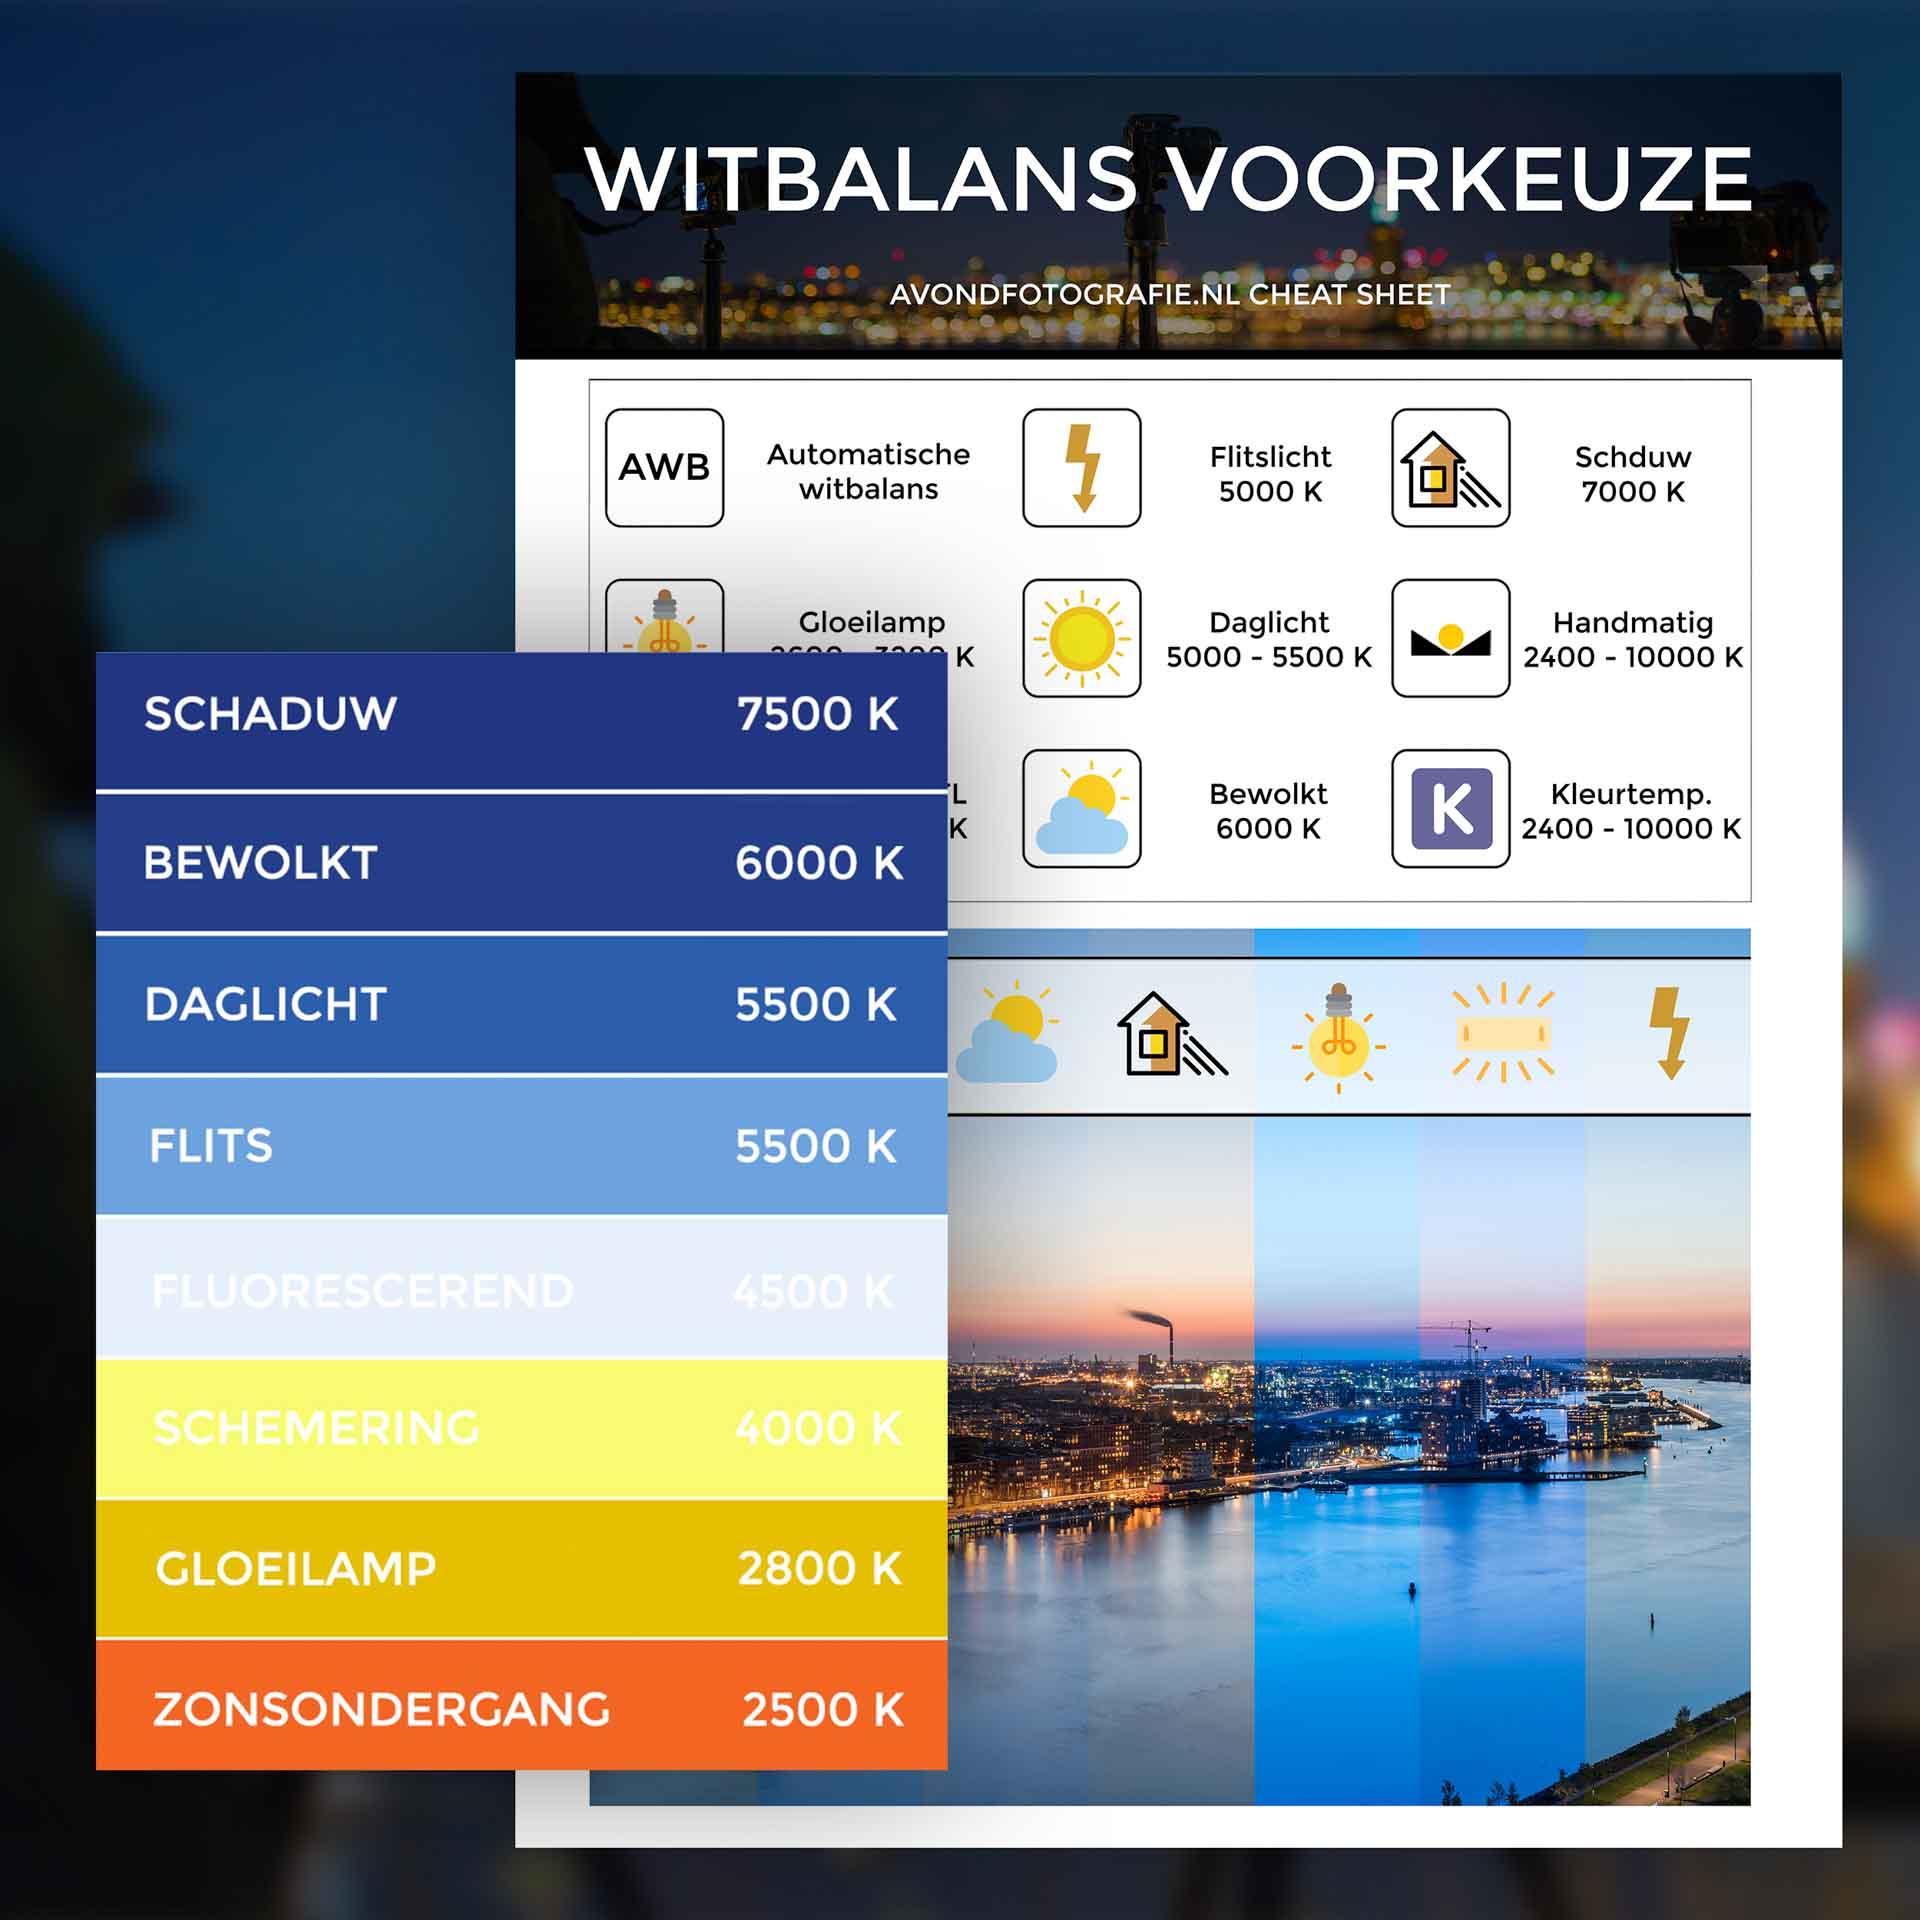 Witbalans voorkeuze cheat sheet - Avondfotografie.nl